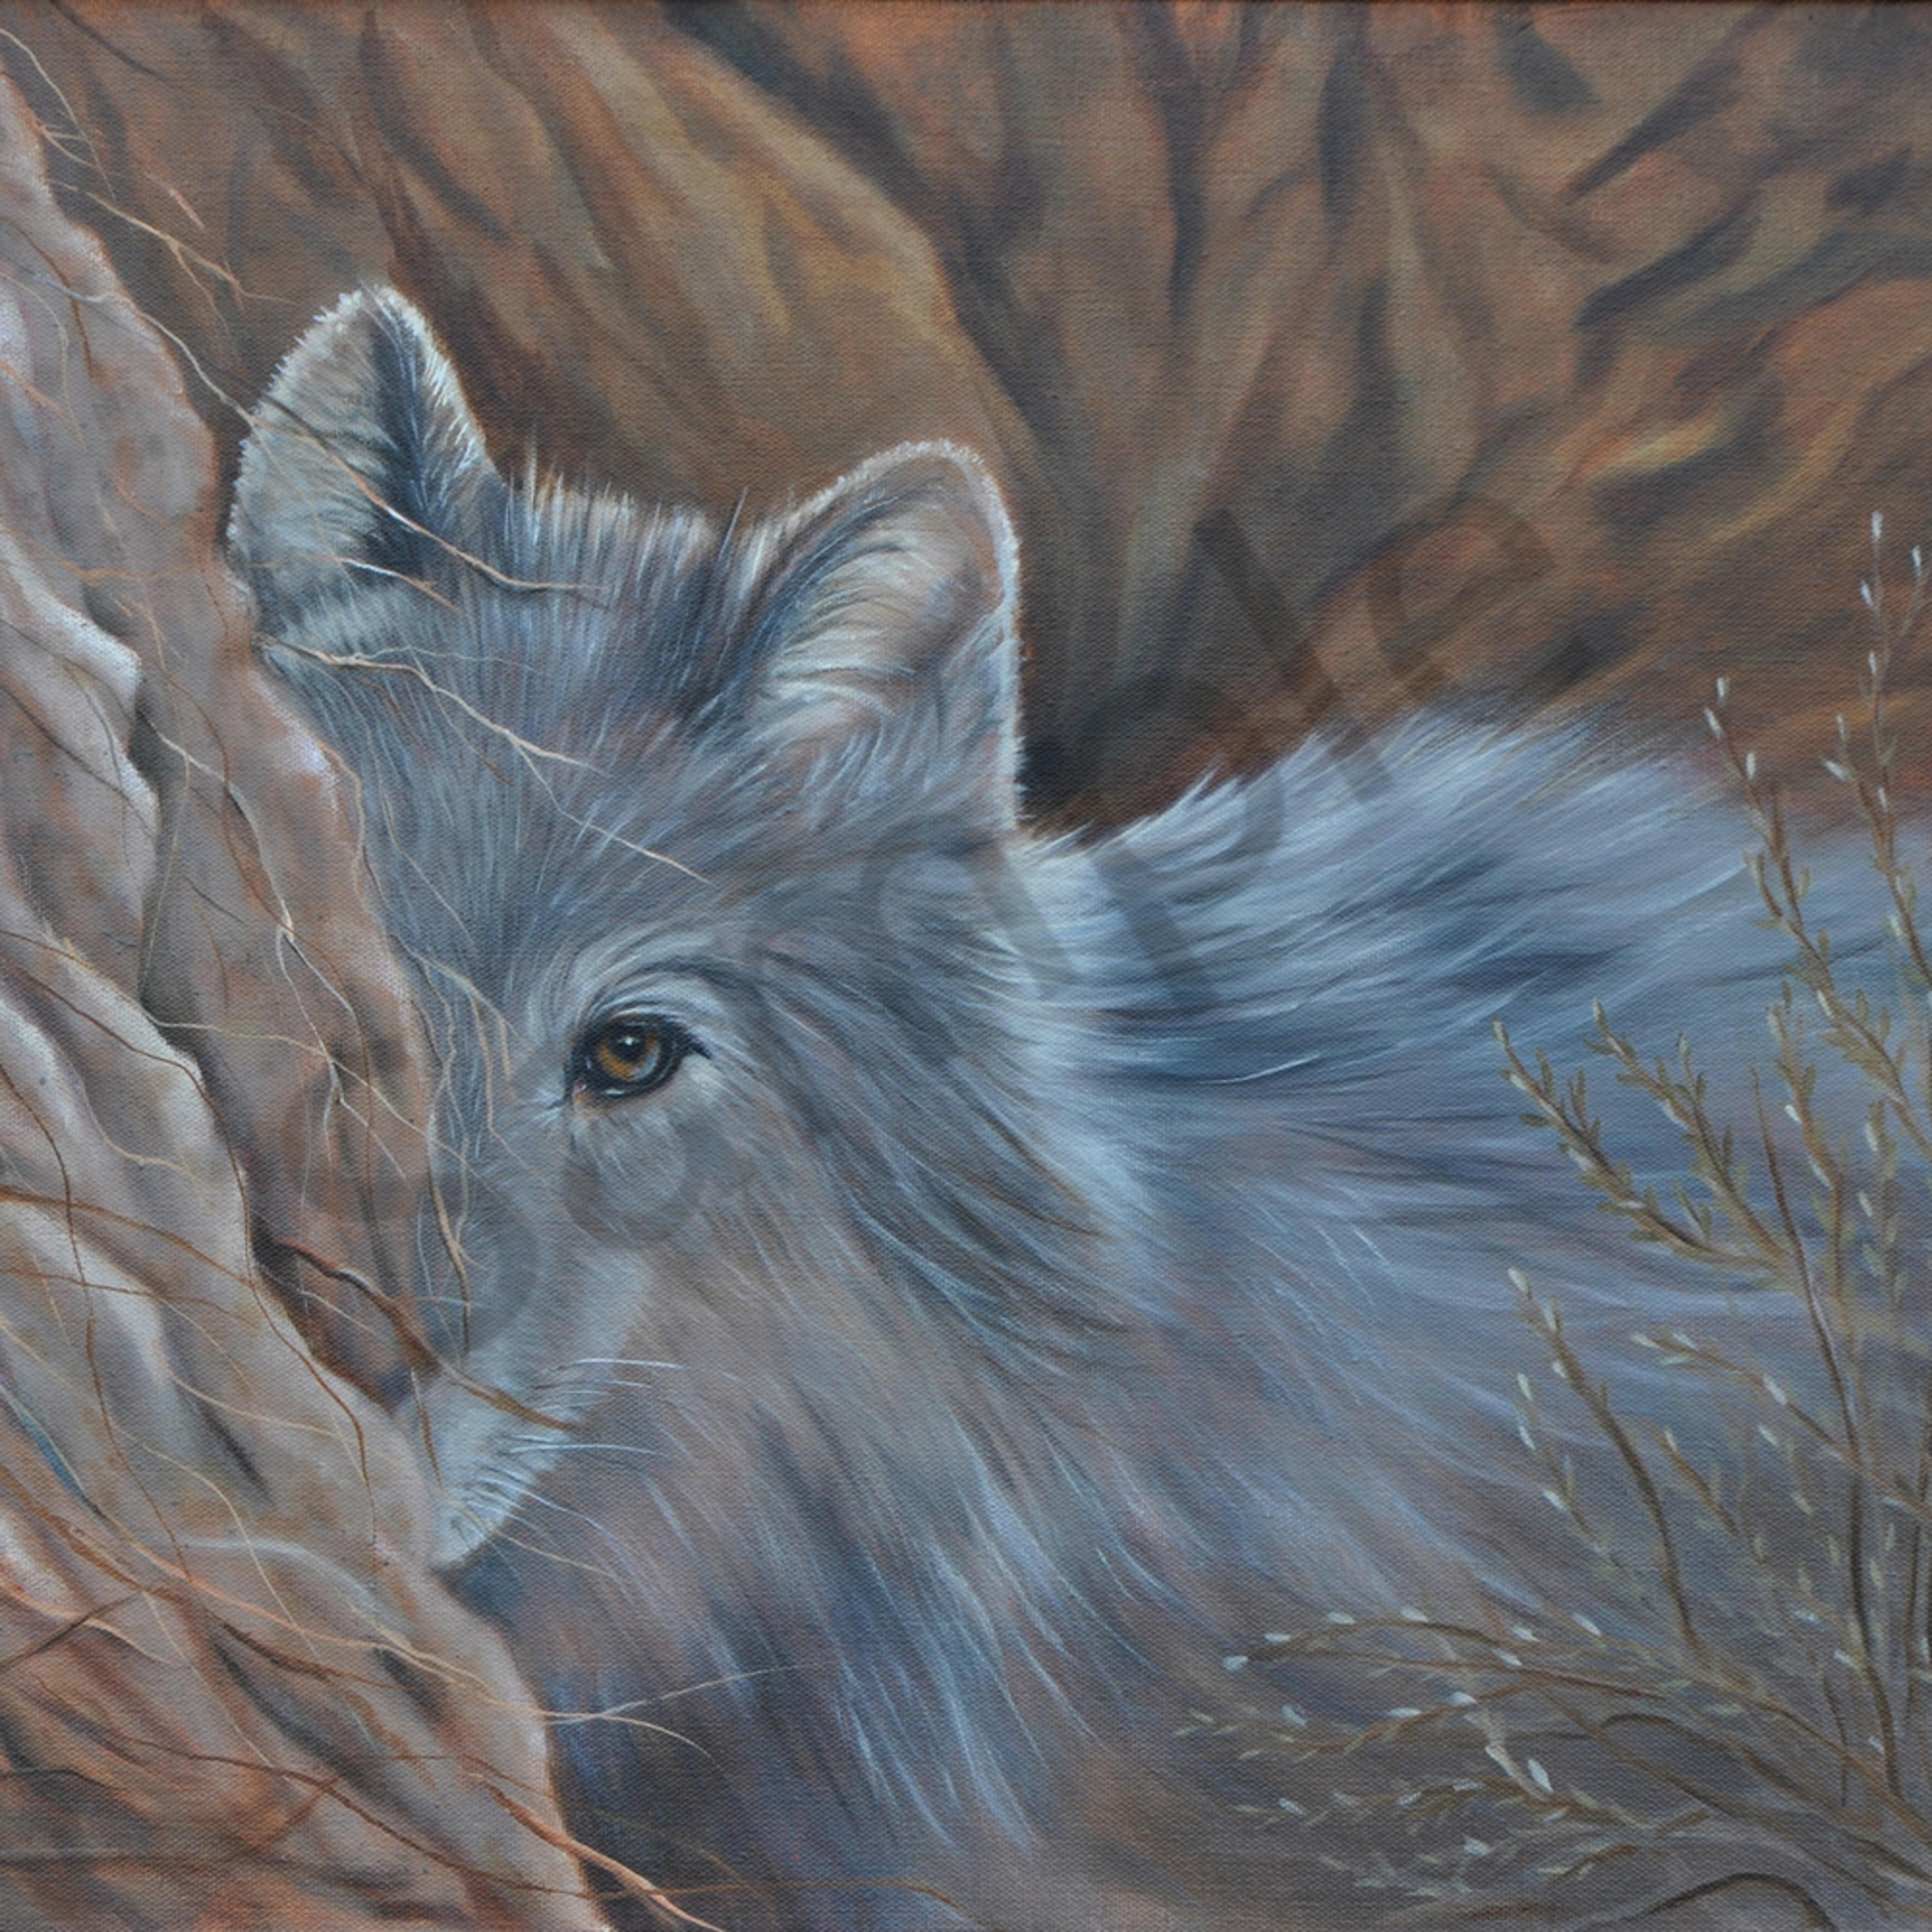 Shewolf vertical dg h9hayy